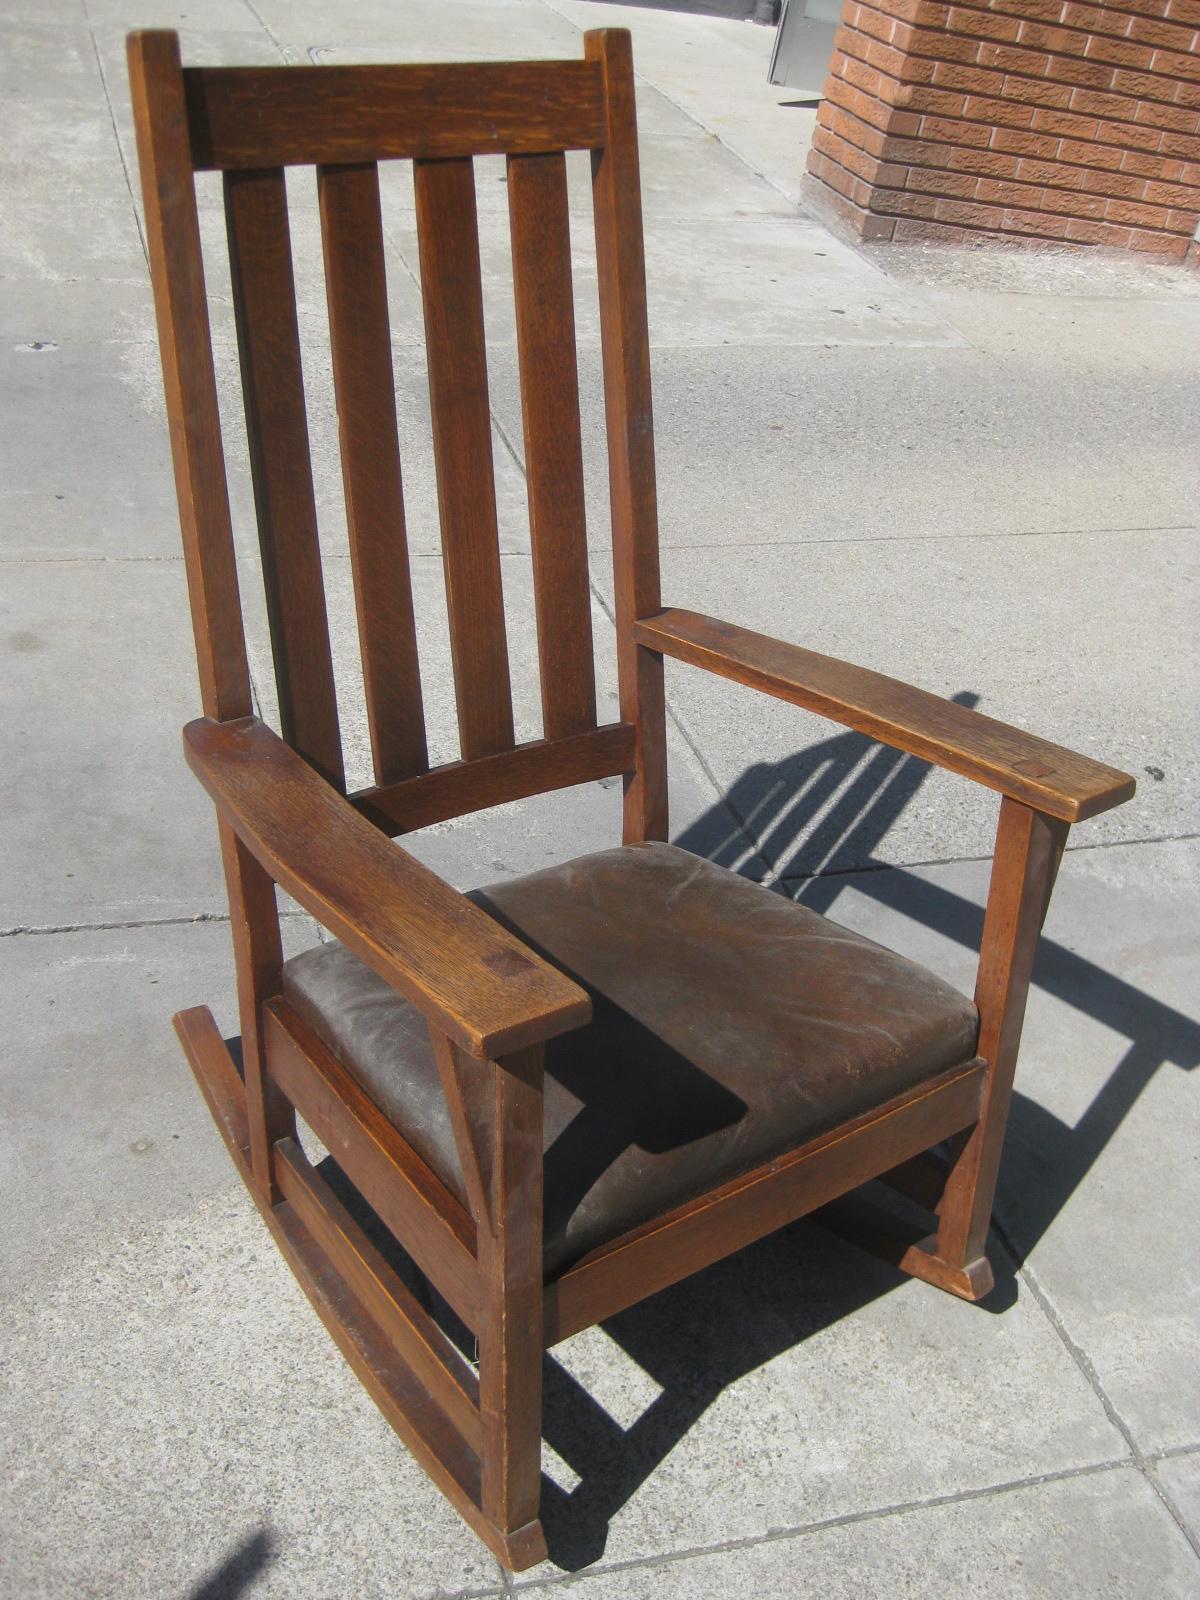 SOLD - Mission Oak Rocking Chair - $275 - UHURU FURNITURE & COLLECTIBLES: SOLD - Mission Oak Rocking Chair - $275